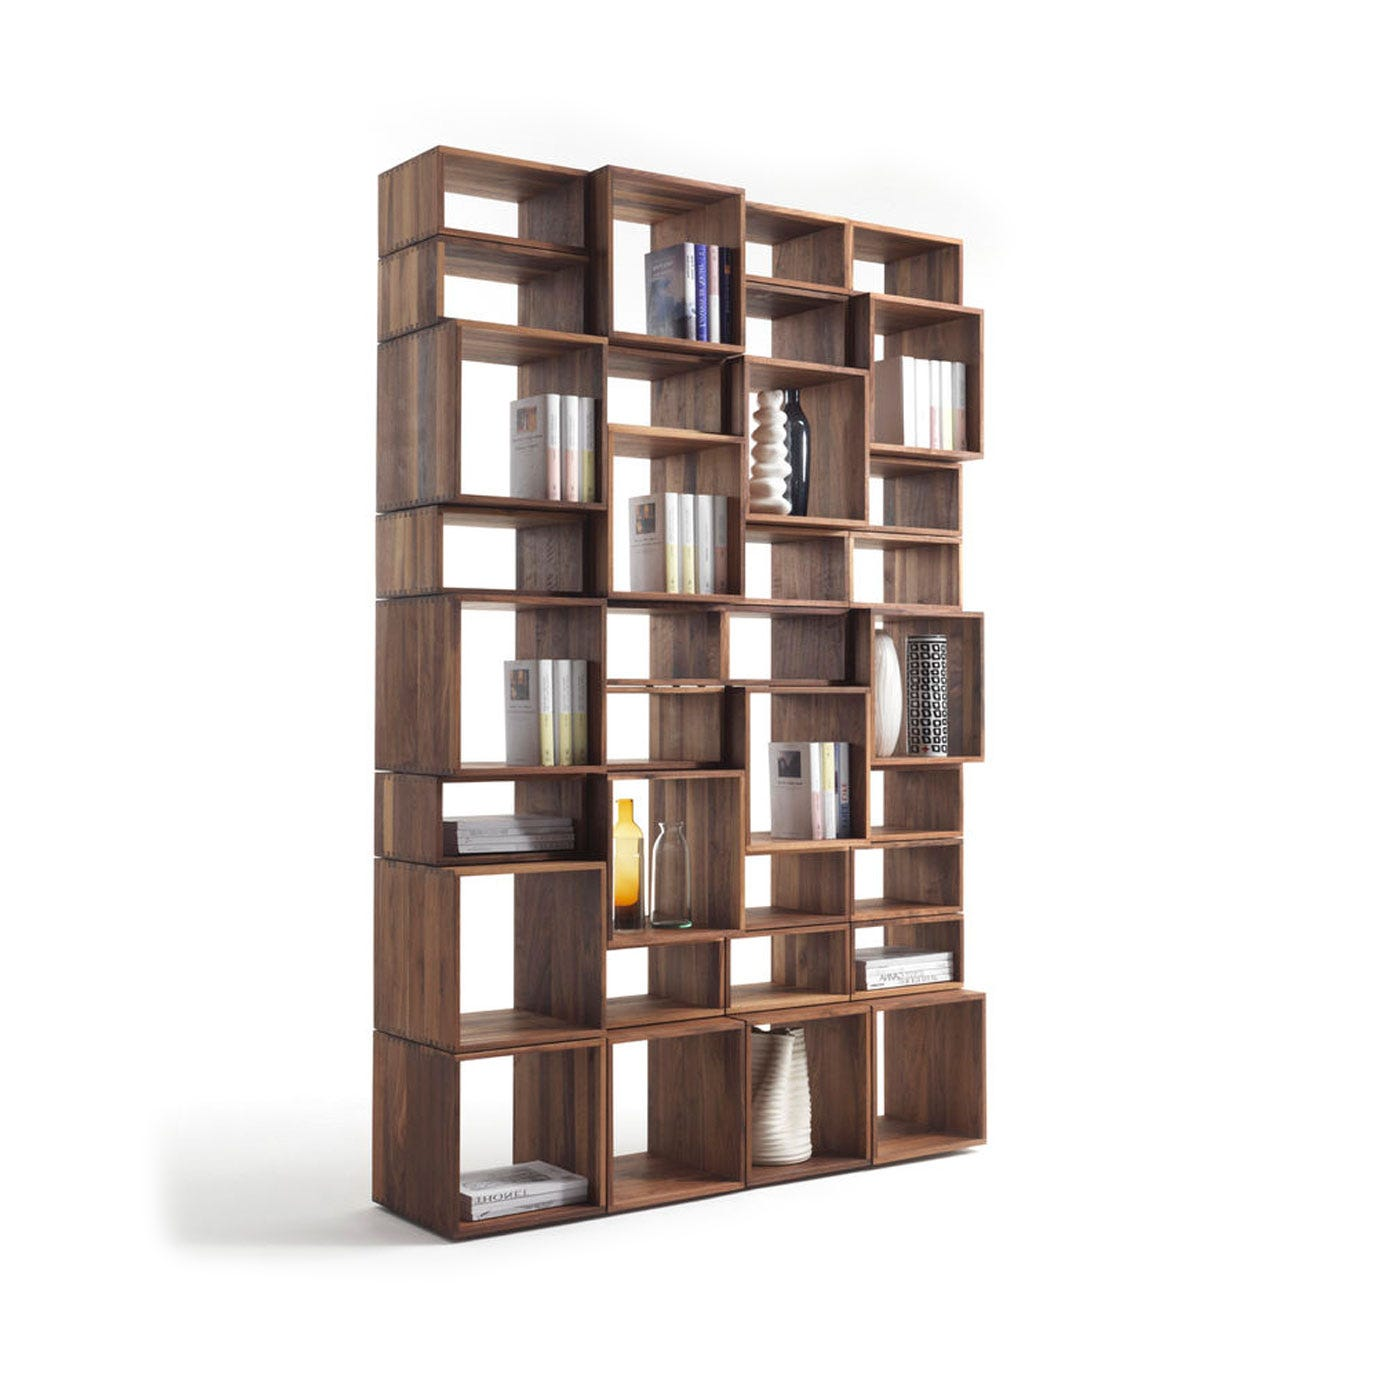 Riva 1920 Freedom Project 4 Bookshelf In Walnut